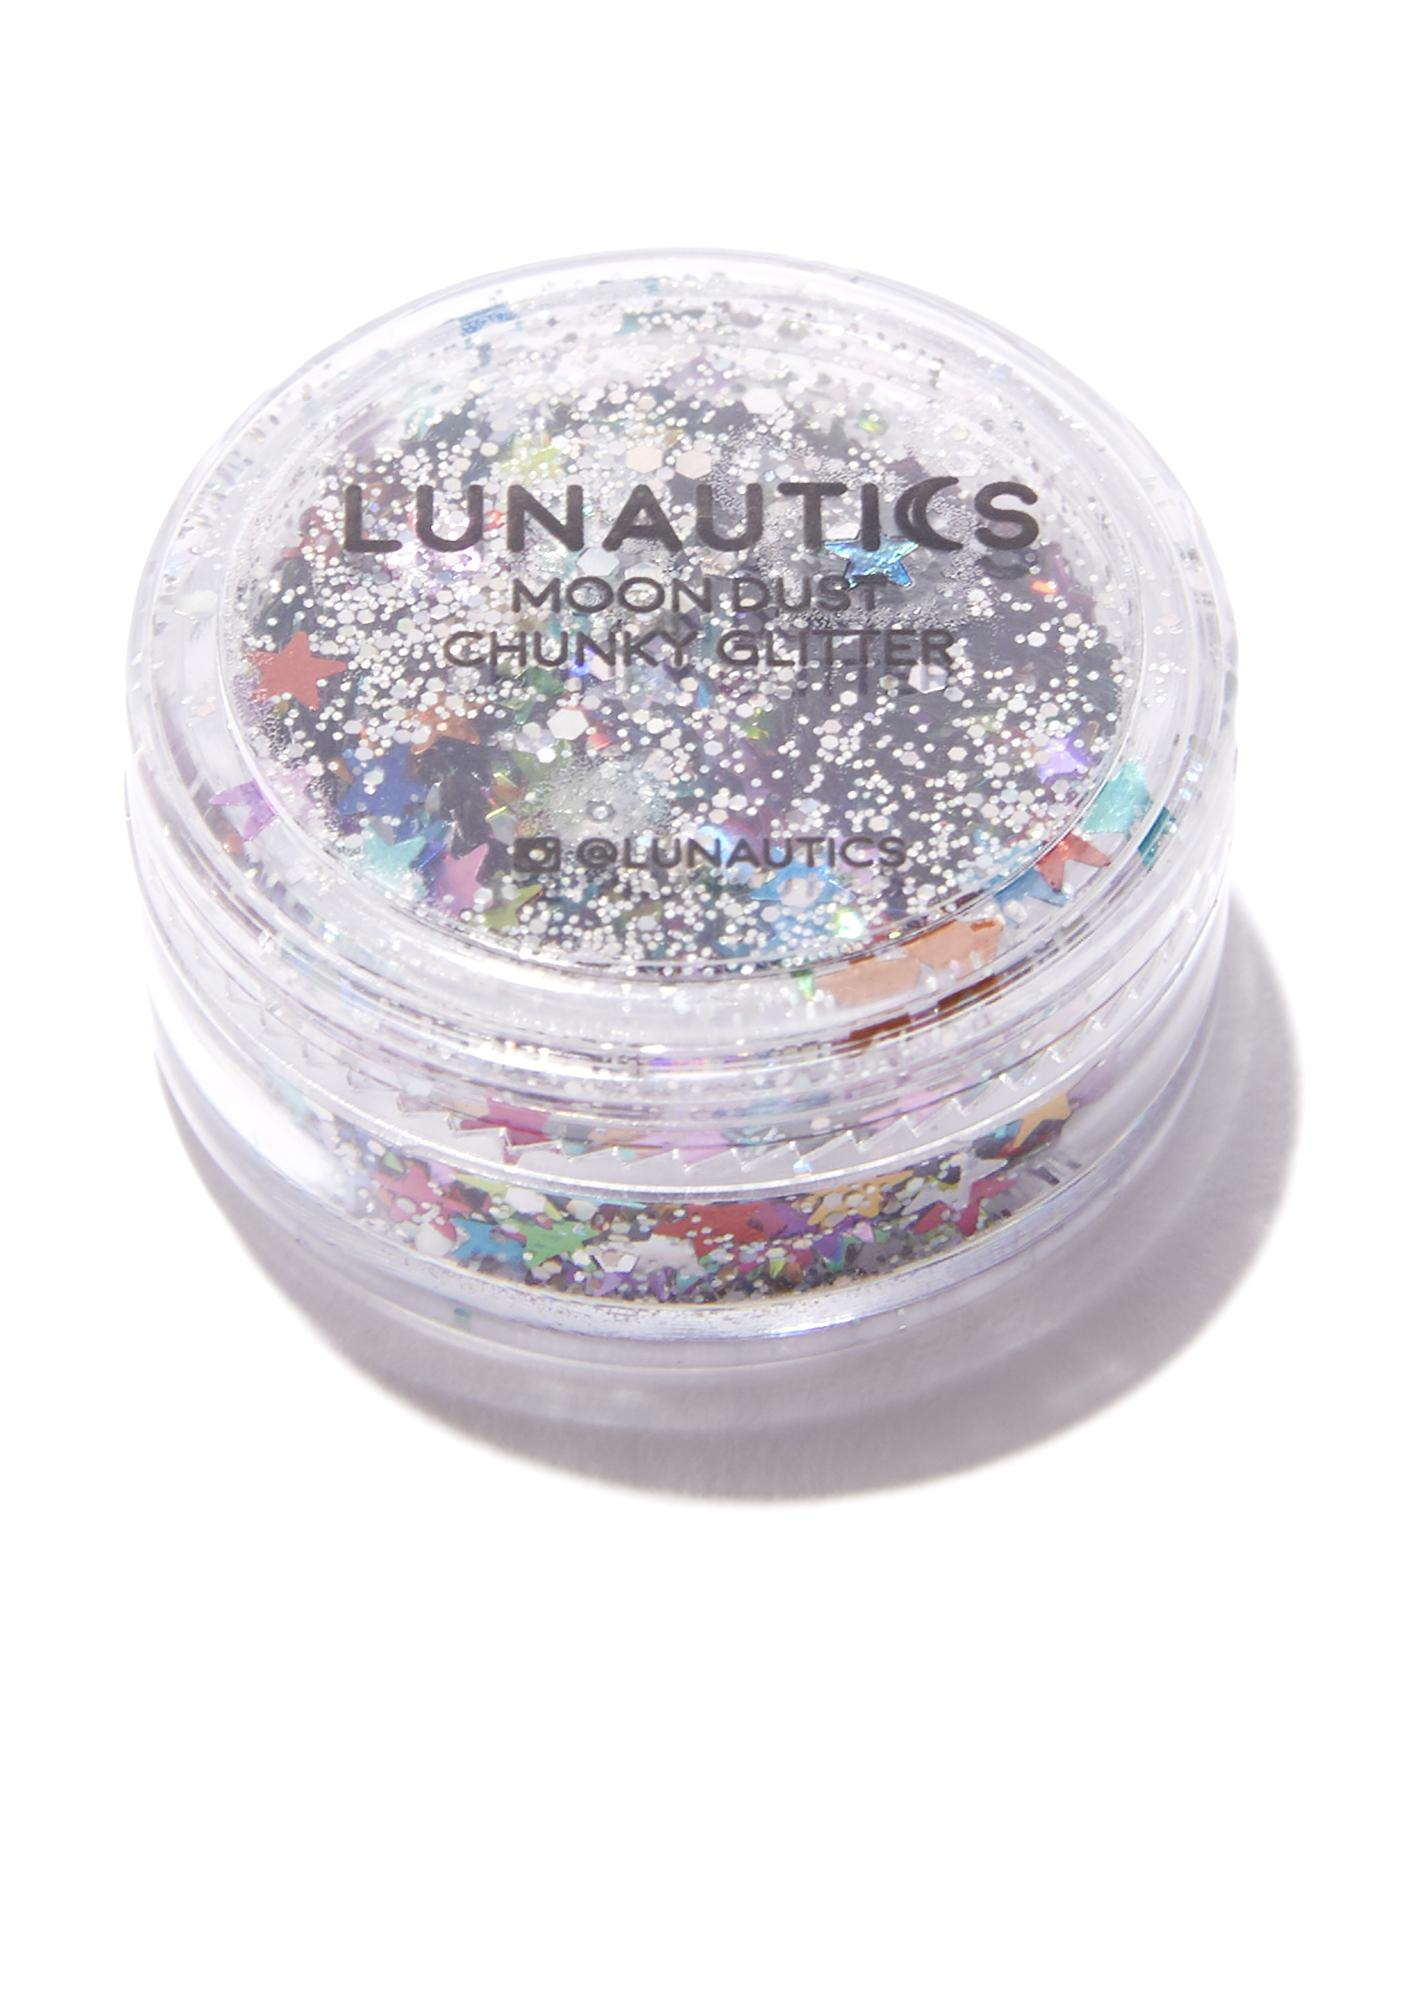 Lunautics Starlet Moon Dust Glitter